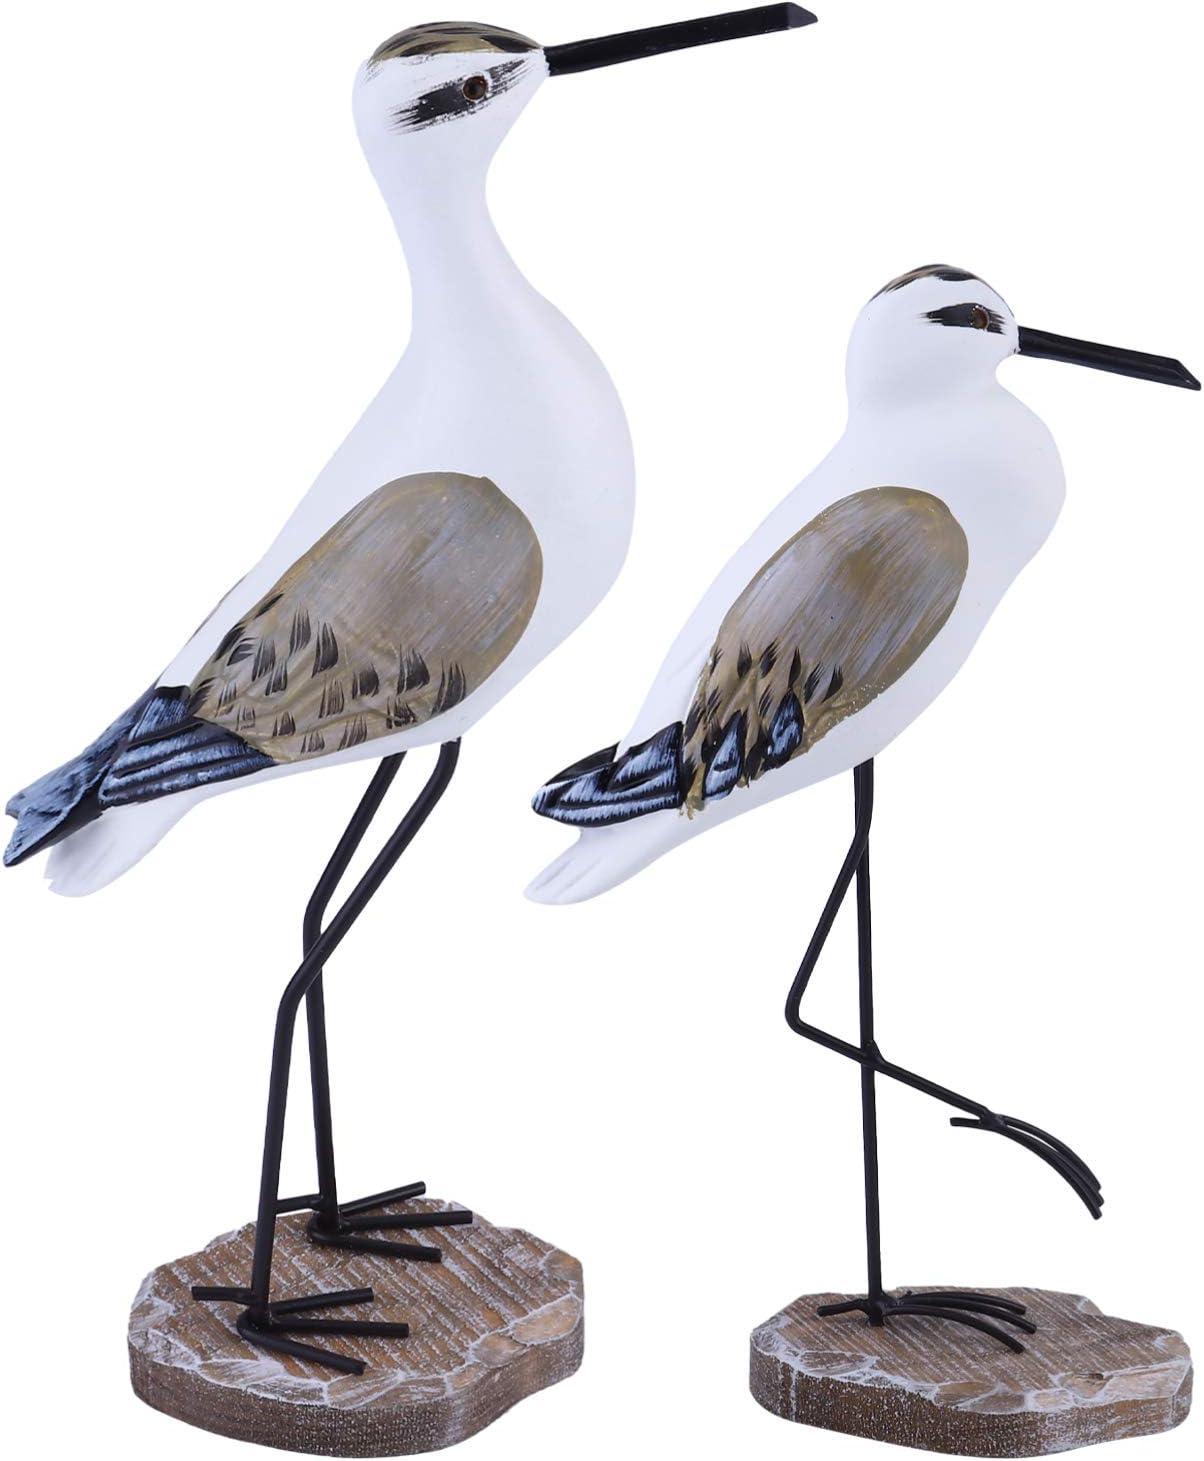 ARTIBETTER 2 Pcs Nautical Statue Seagull Figurine Decorations Vintage Bird Statue Coastal Beach Table Home Decorations Nautical Gifts Light Brown